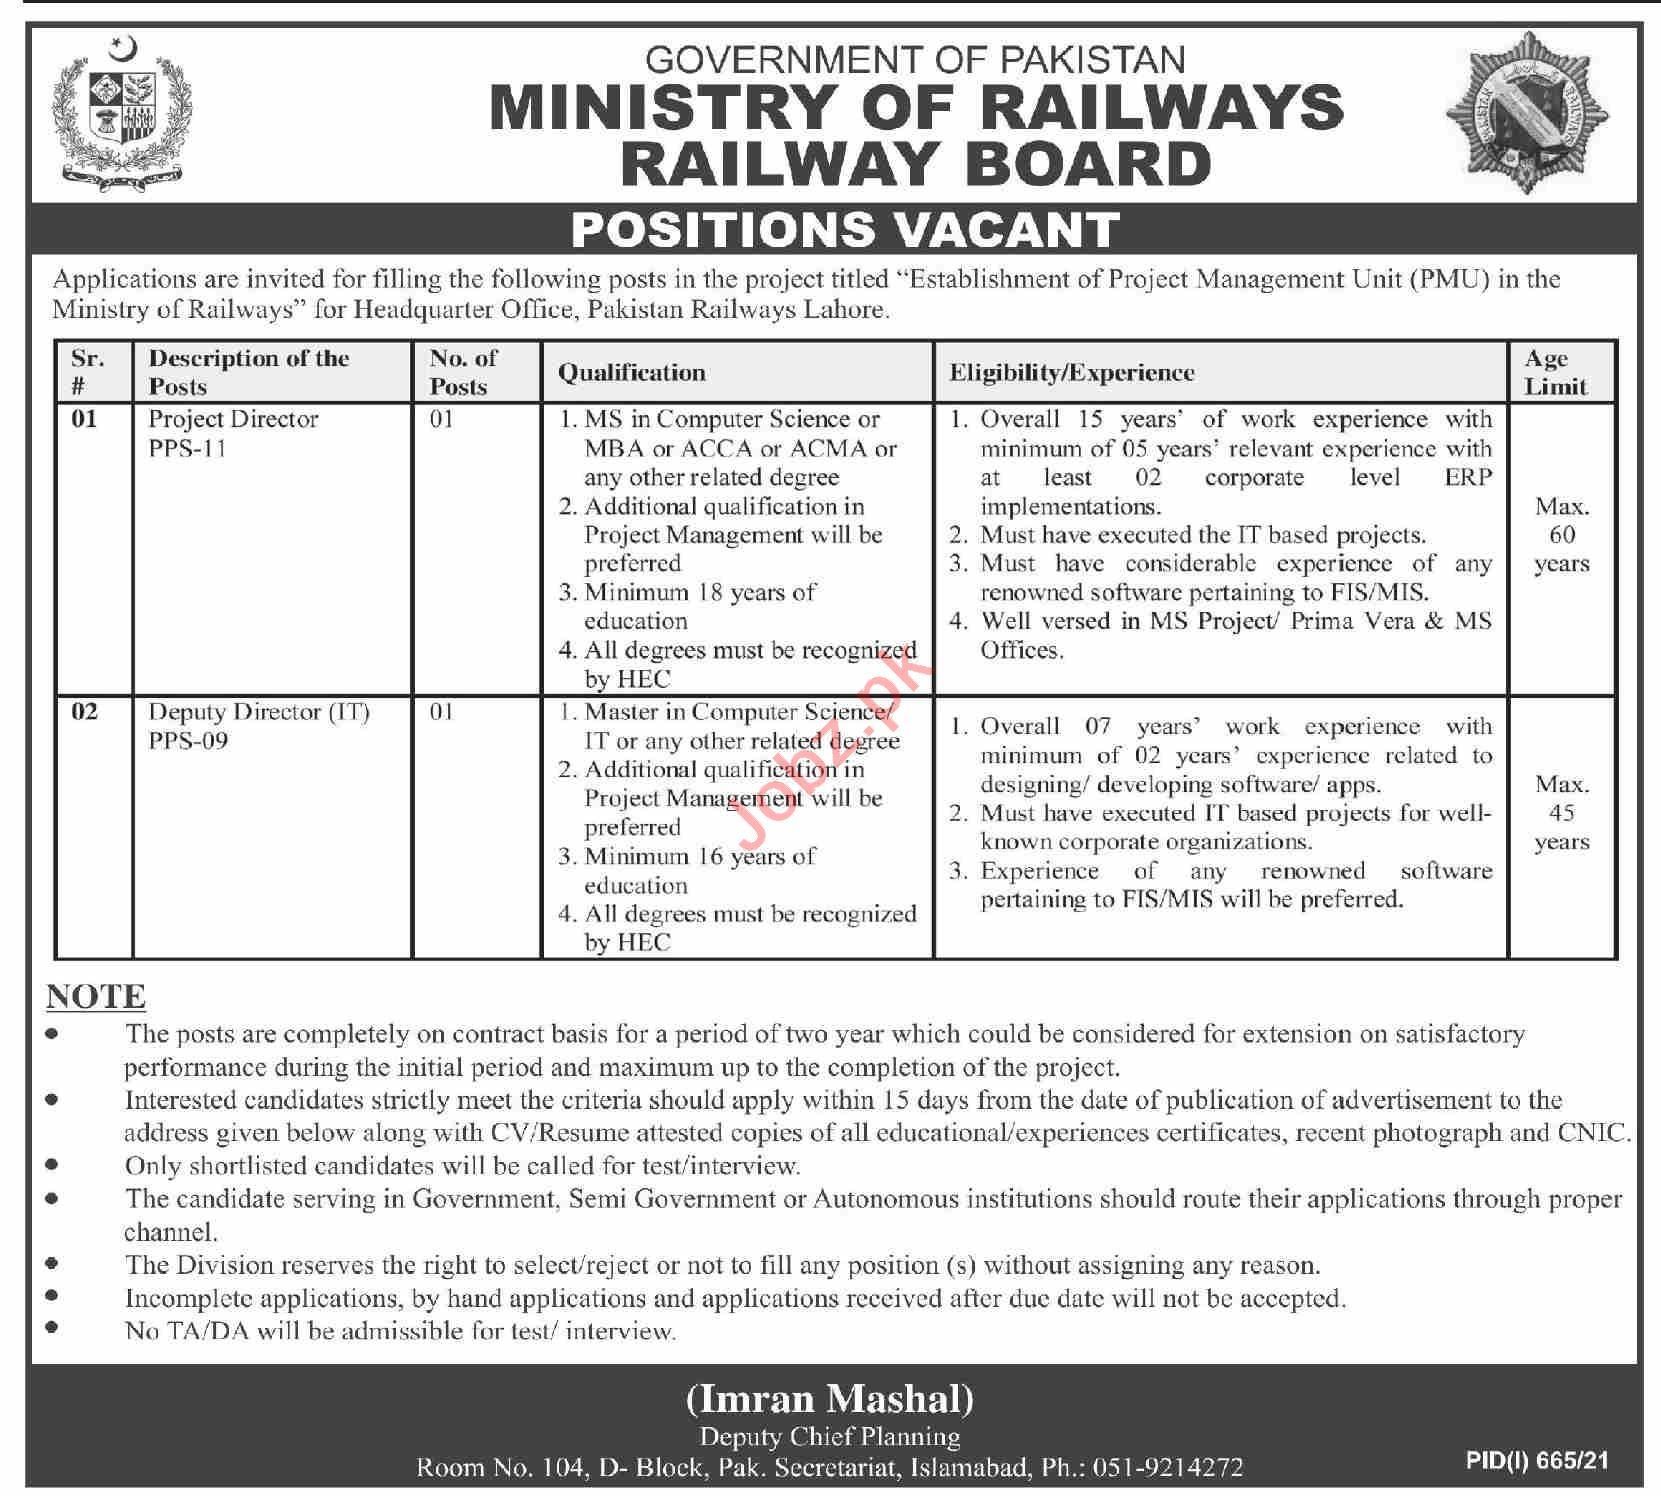 Railways Board Ministry of Railways Jobs 2021 for Director